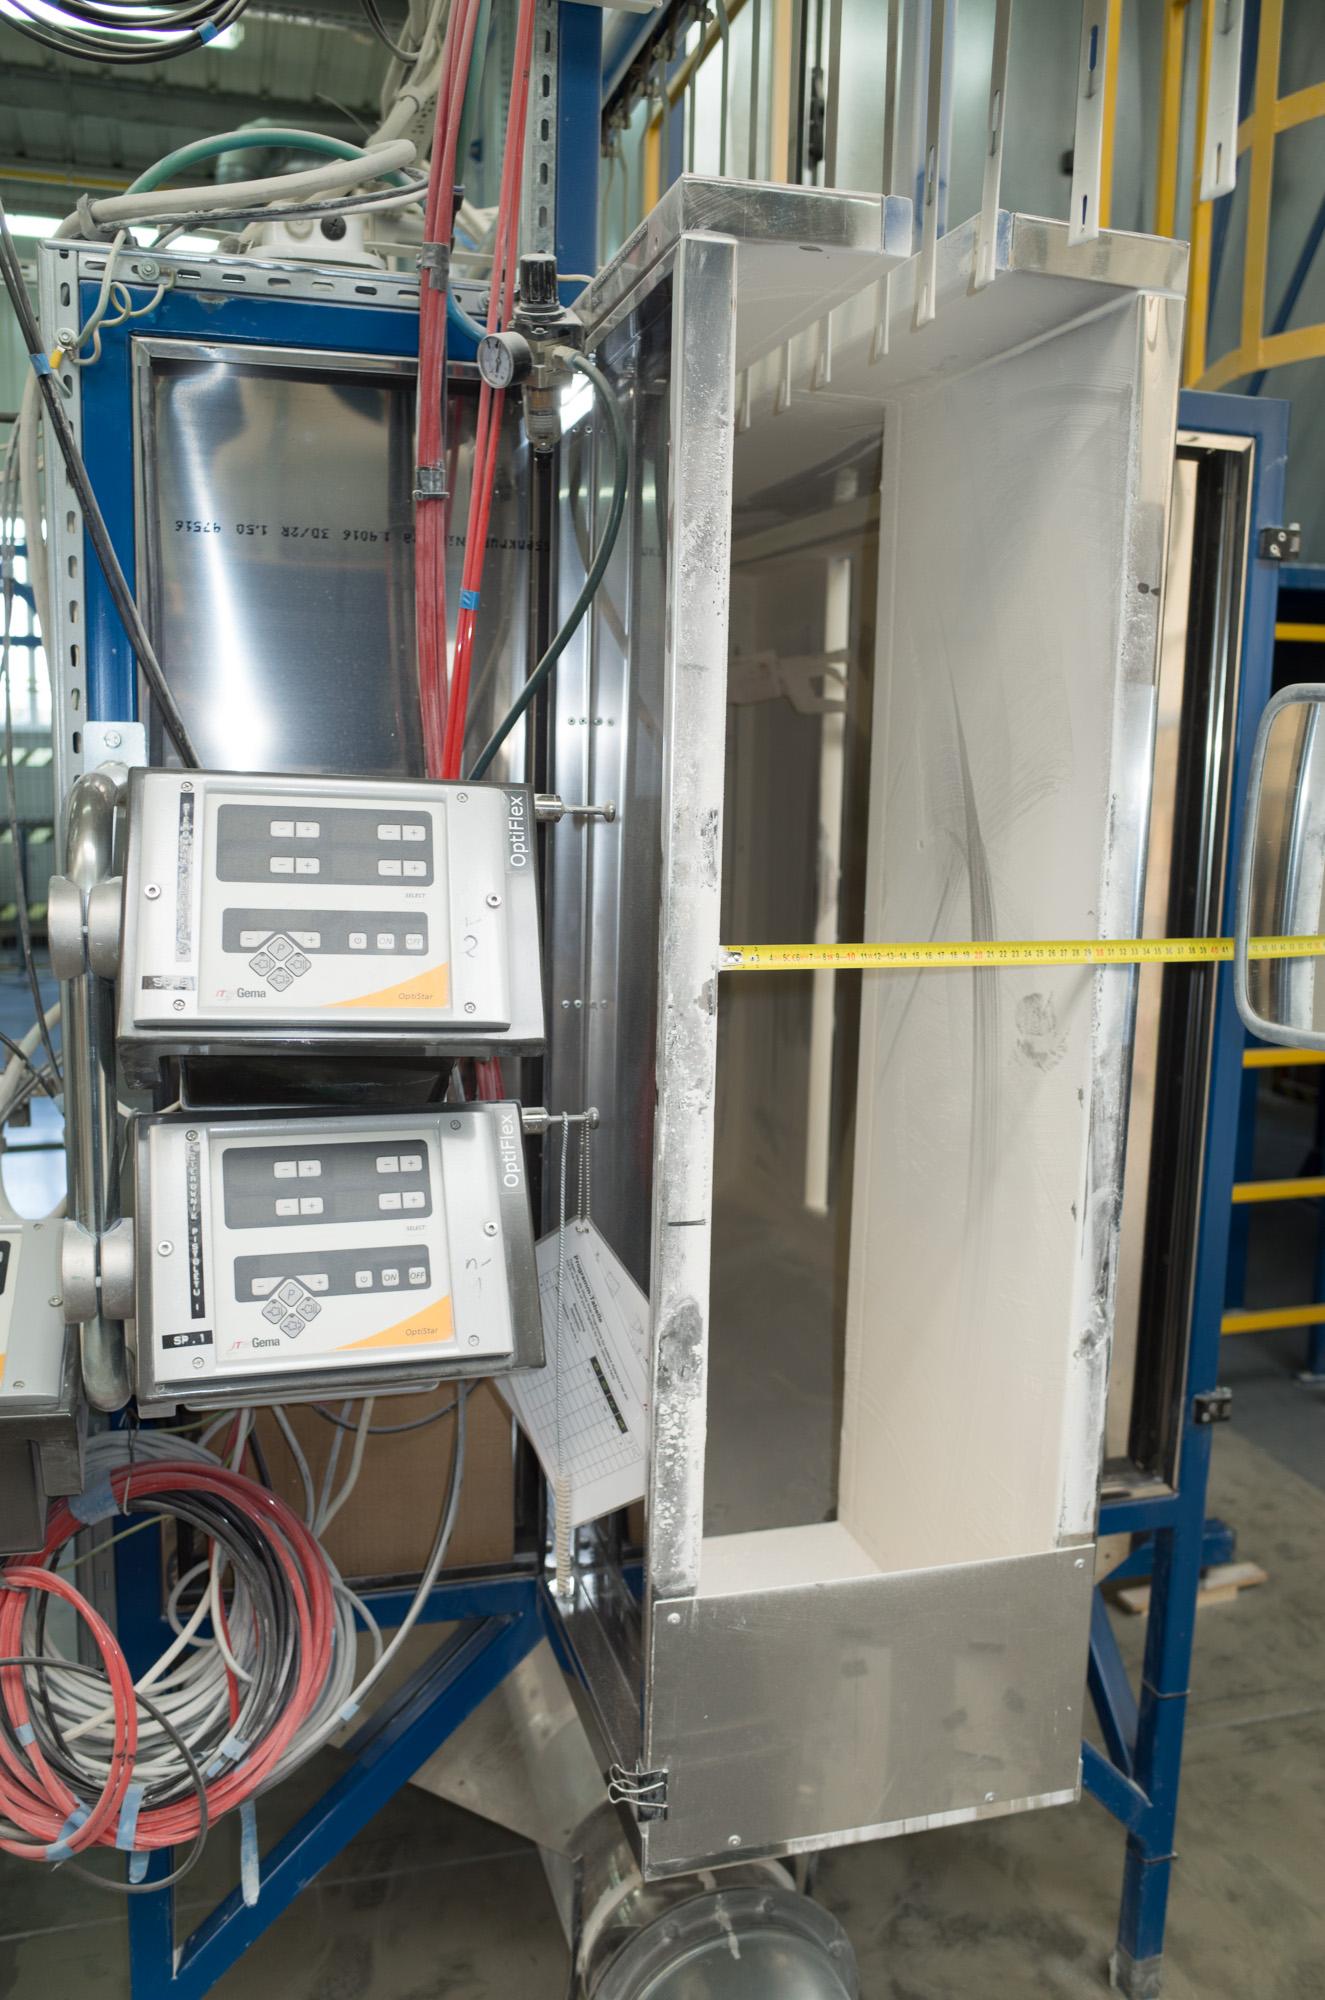 Cabina di verniciatura ekomal macchinari usati exapro for Affitti di cabina okanagan bc